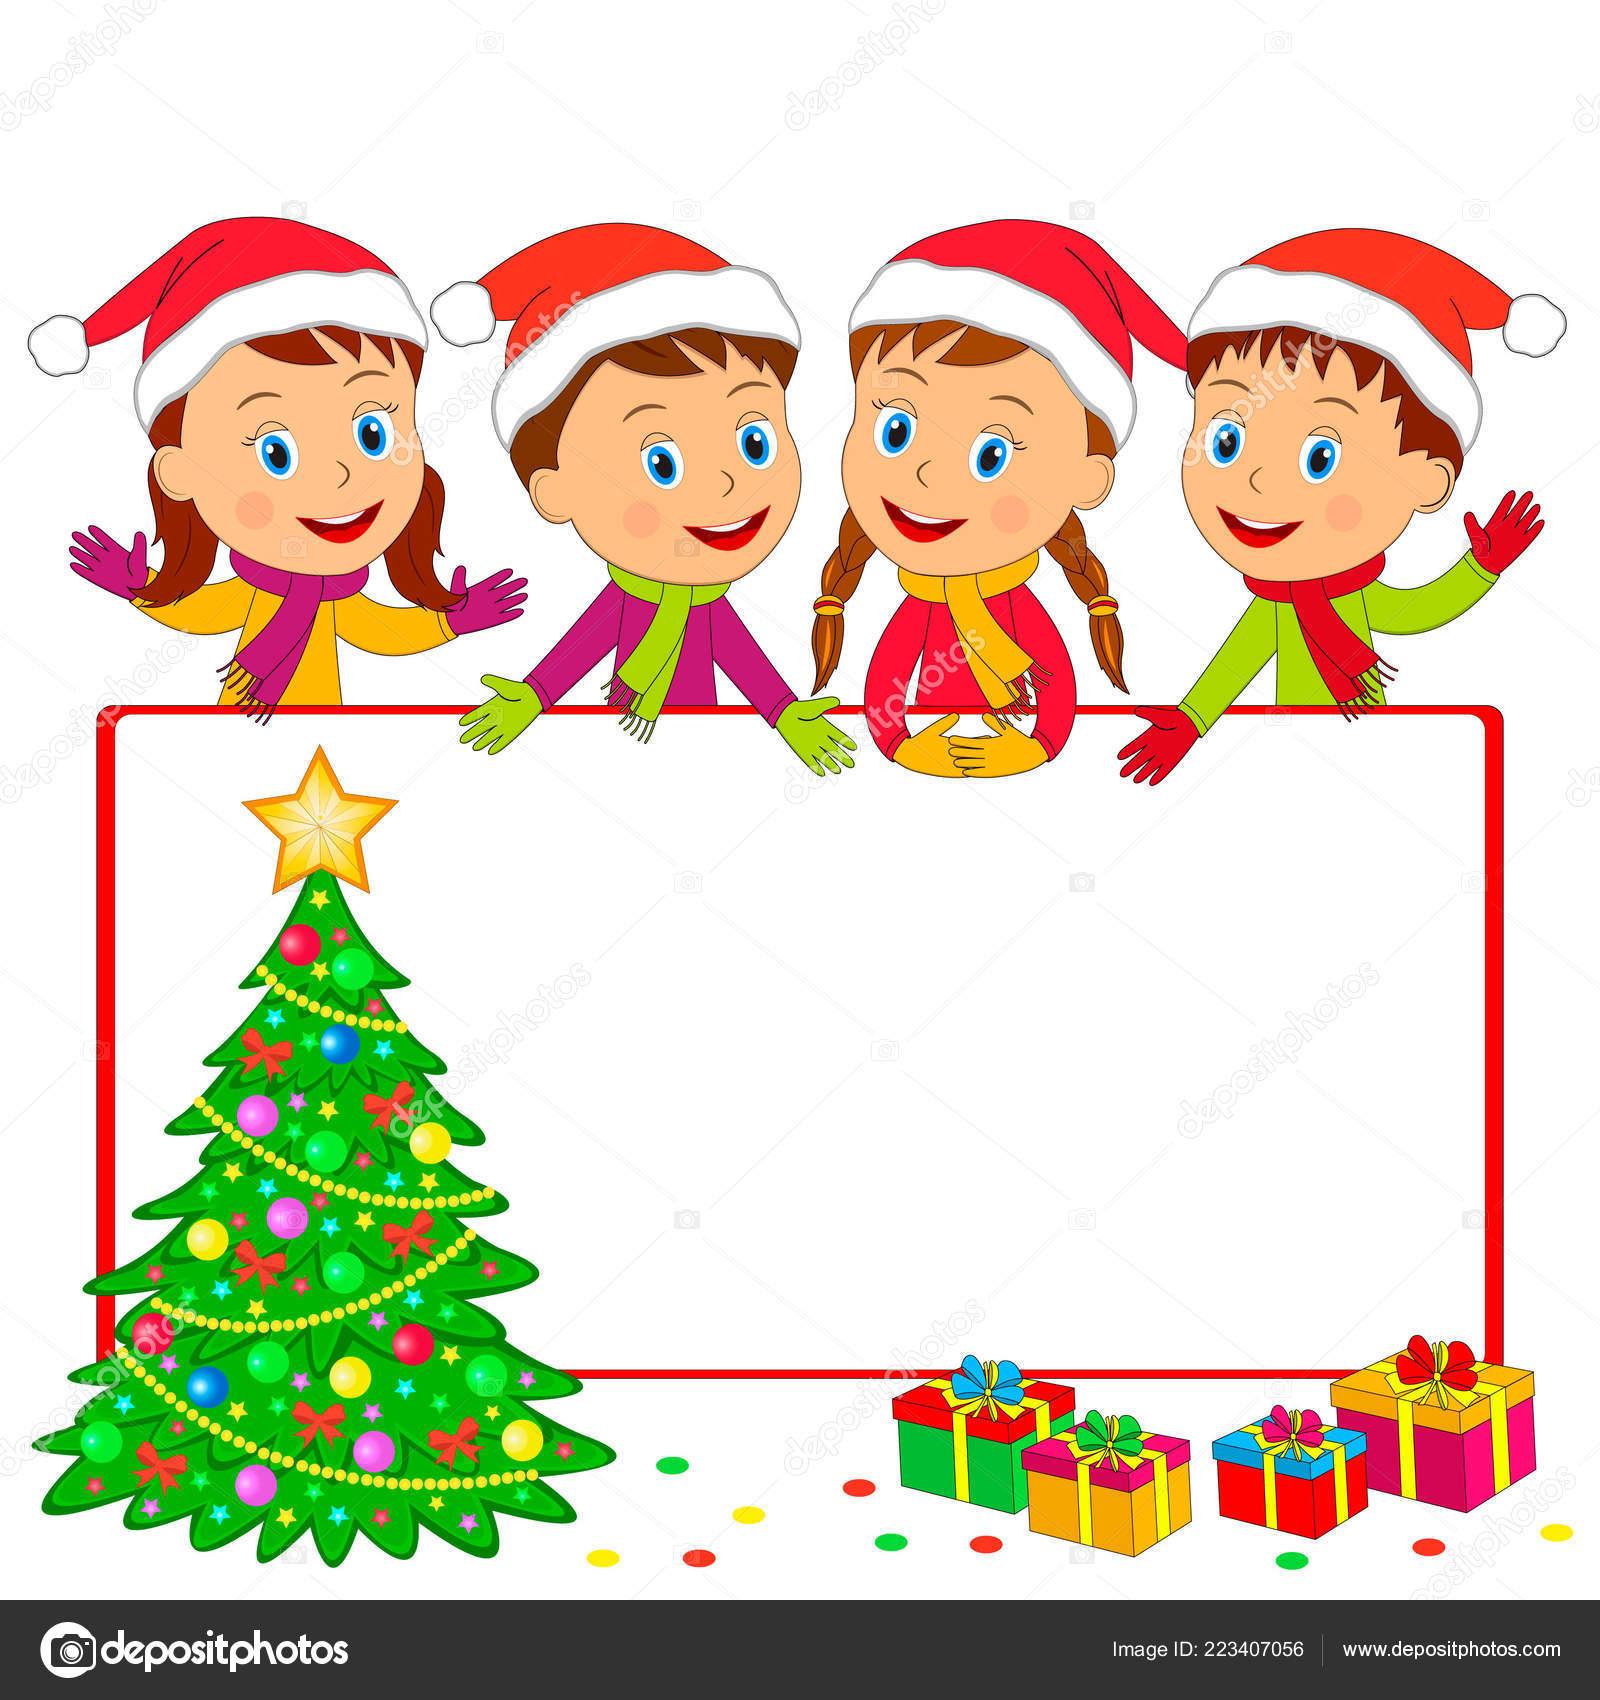 Kids Winter Frame Boys Girls Christmas Tree Gift White Background Vector Image By C Iris828 Vector Stock 223407056